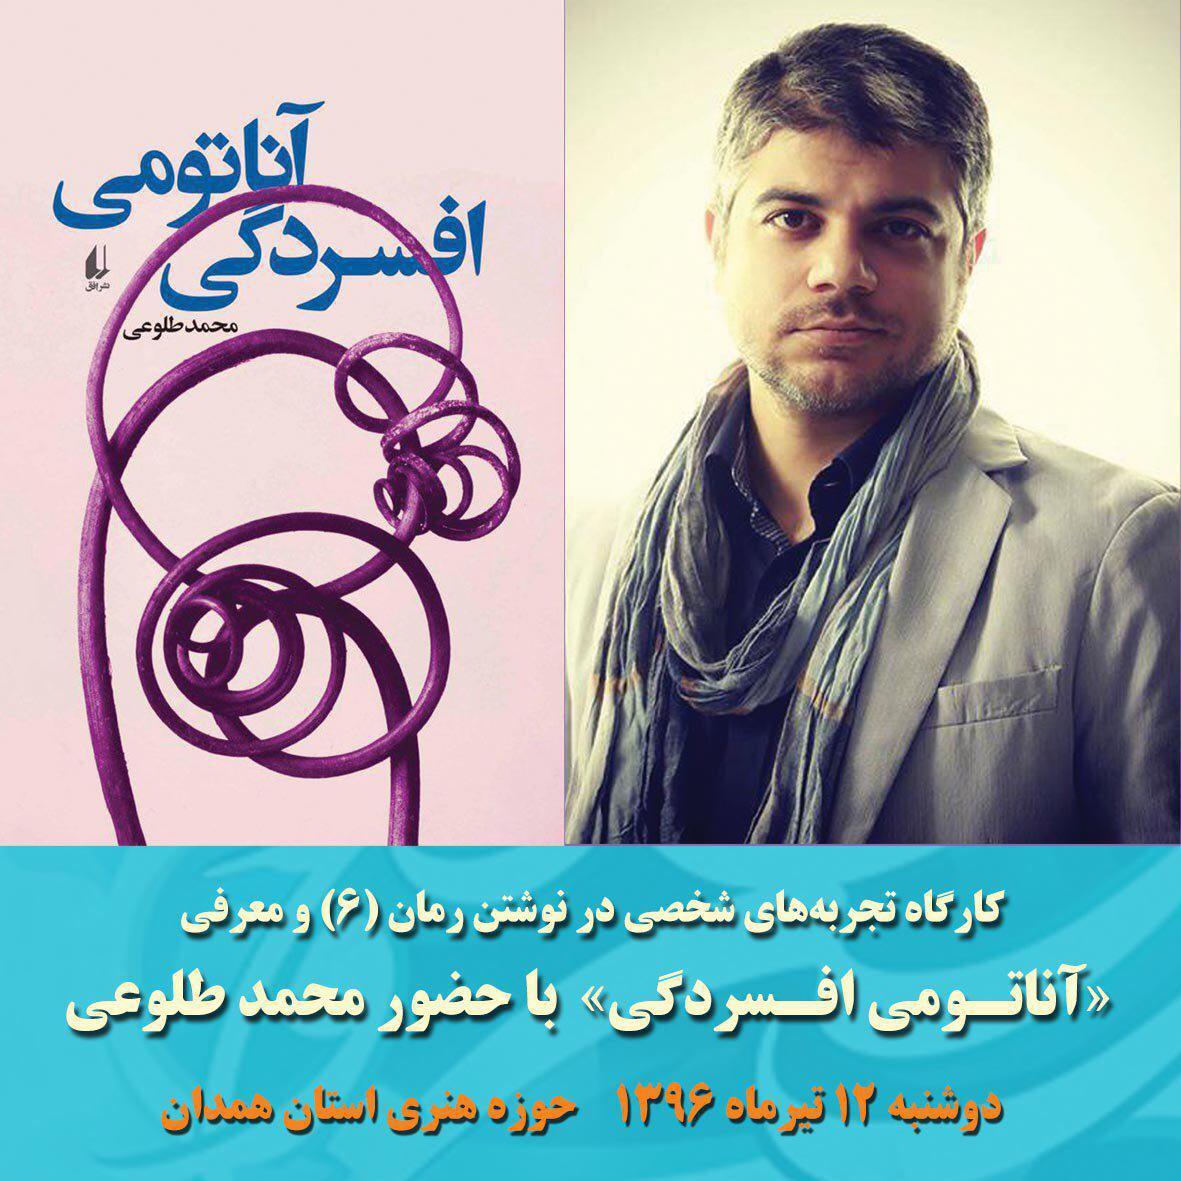 photo ۲۰۱۷ ۰۷ ۰۱ ۰۸ ۴۱ ۲۶ - معرفي آناتومي افسردگي در حوزه هنري استان همدان